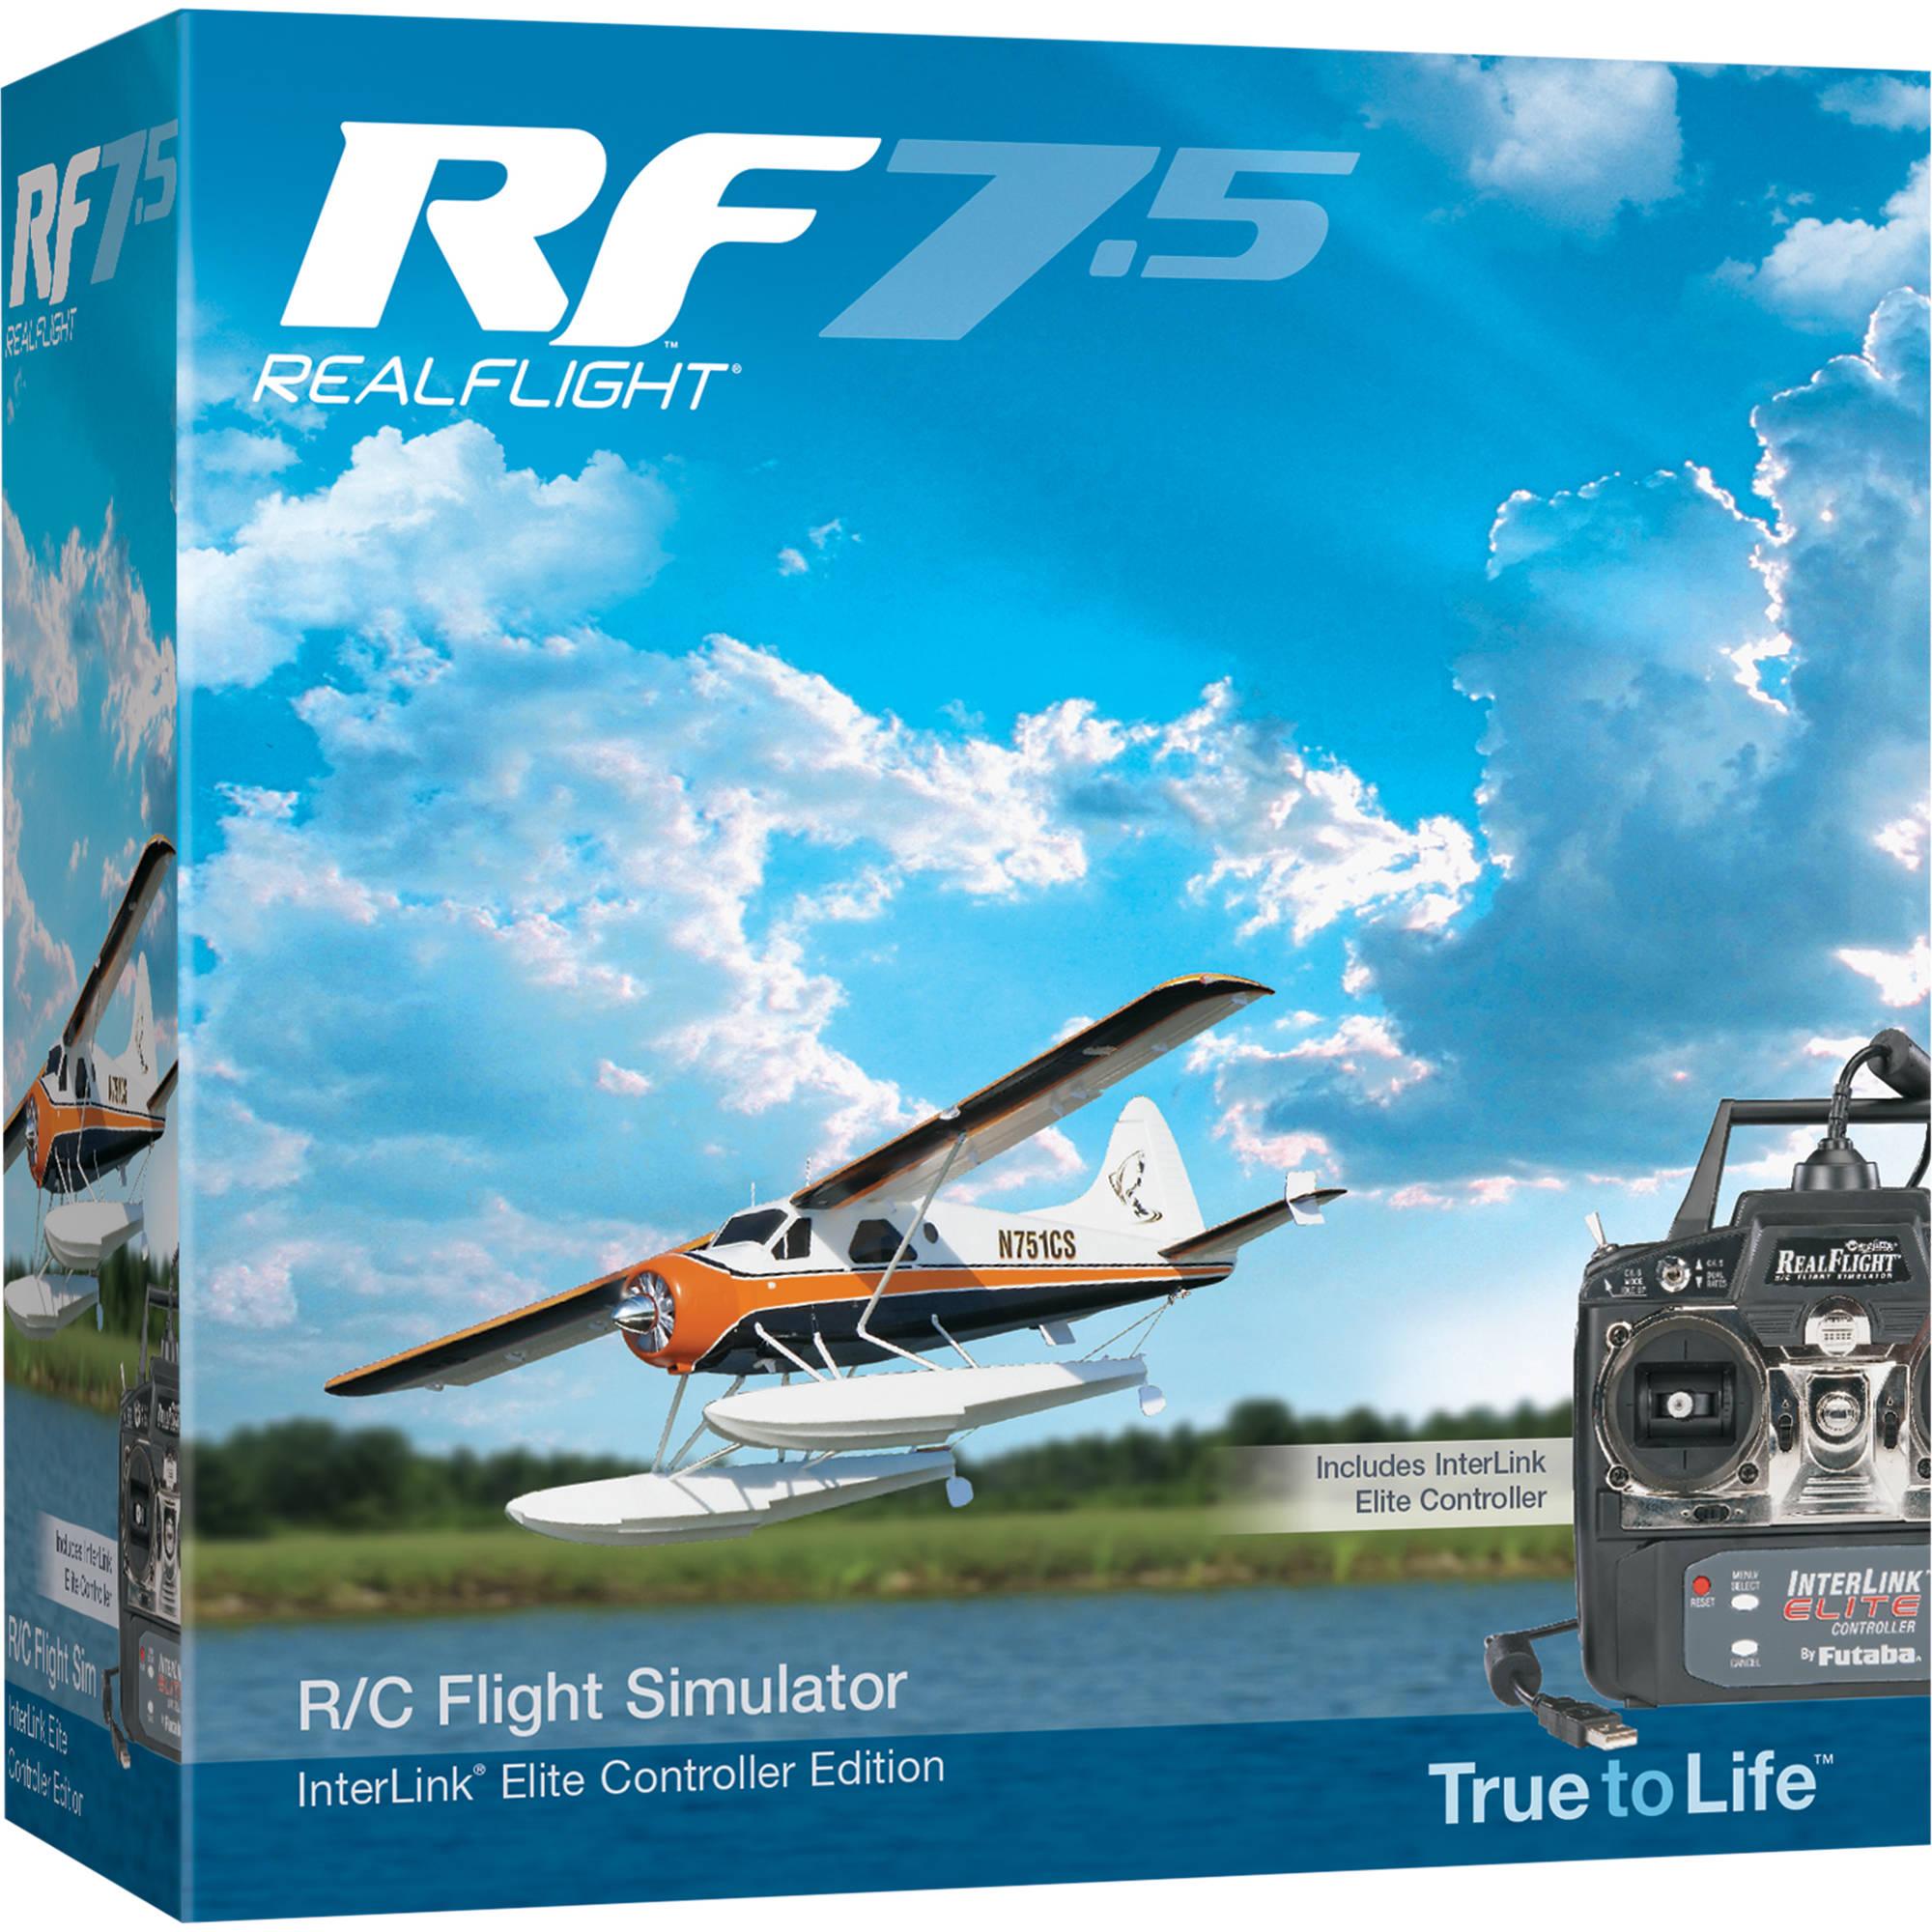 RealFlight RF7 5 R/C Flight Simulator with InterLink Elite Controller